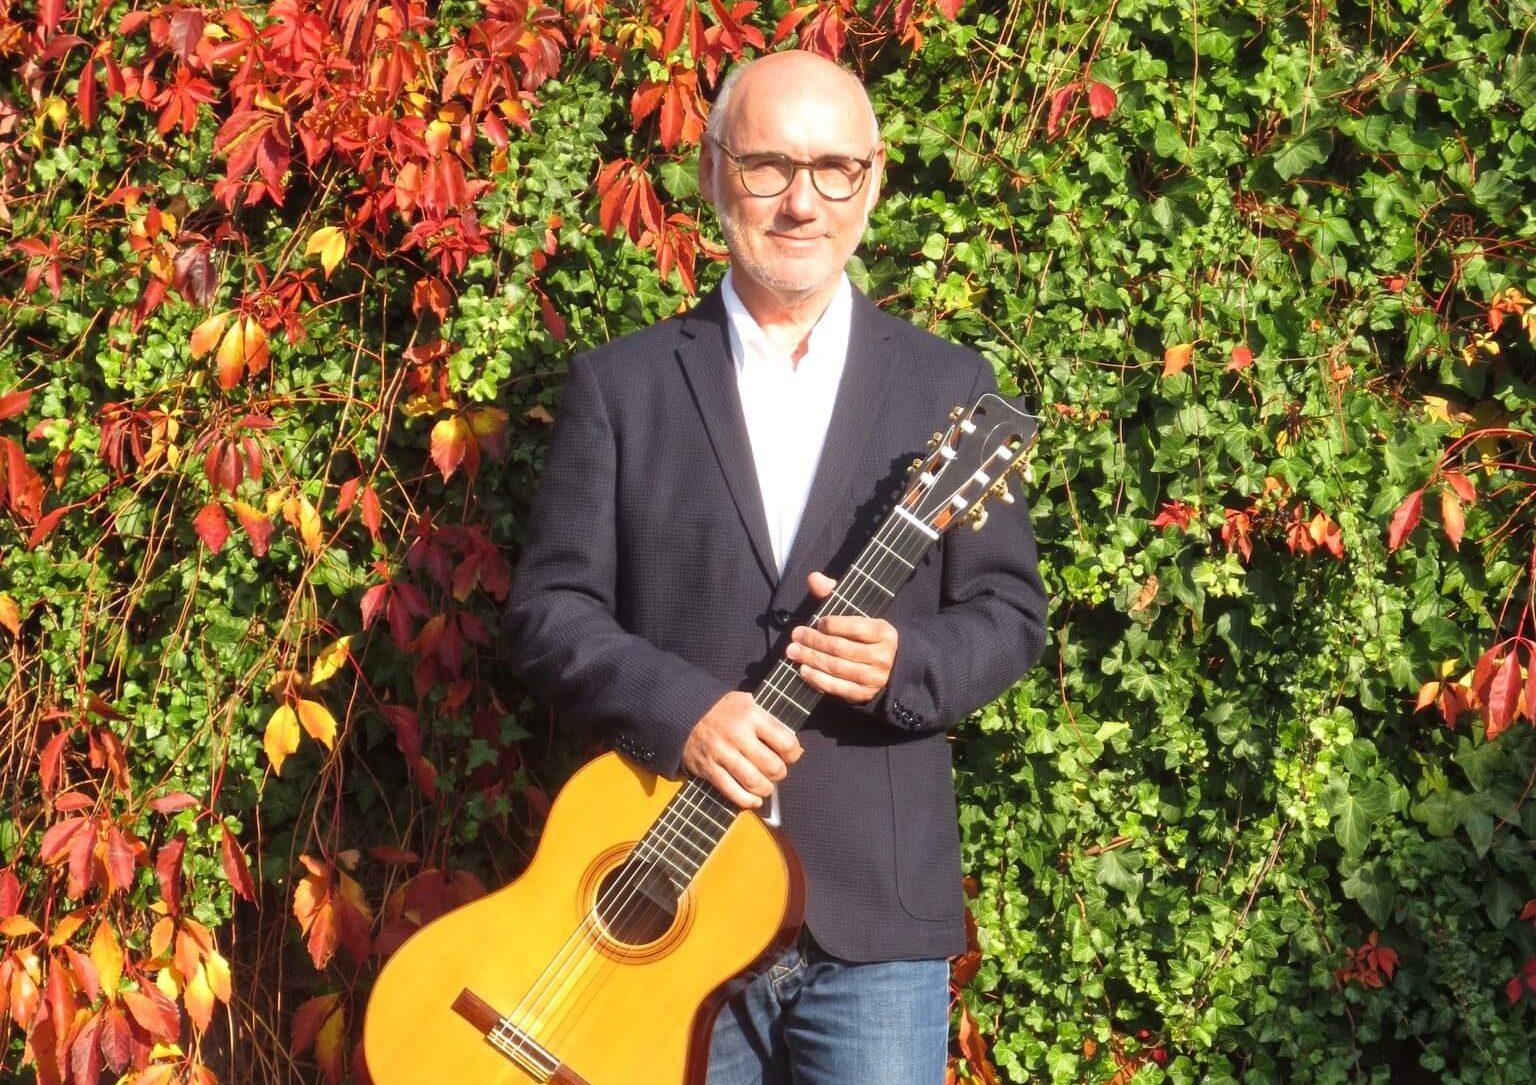 Klassiek Gitarist en uitvaartspecialist